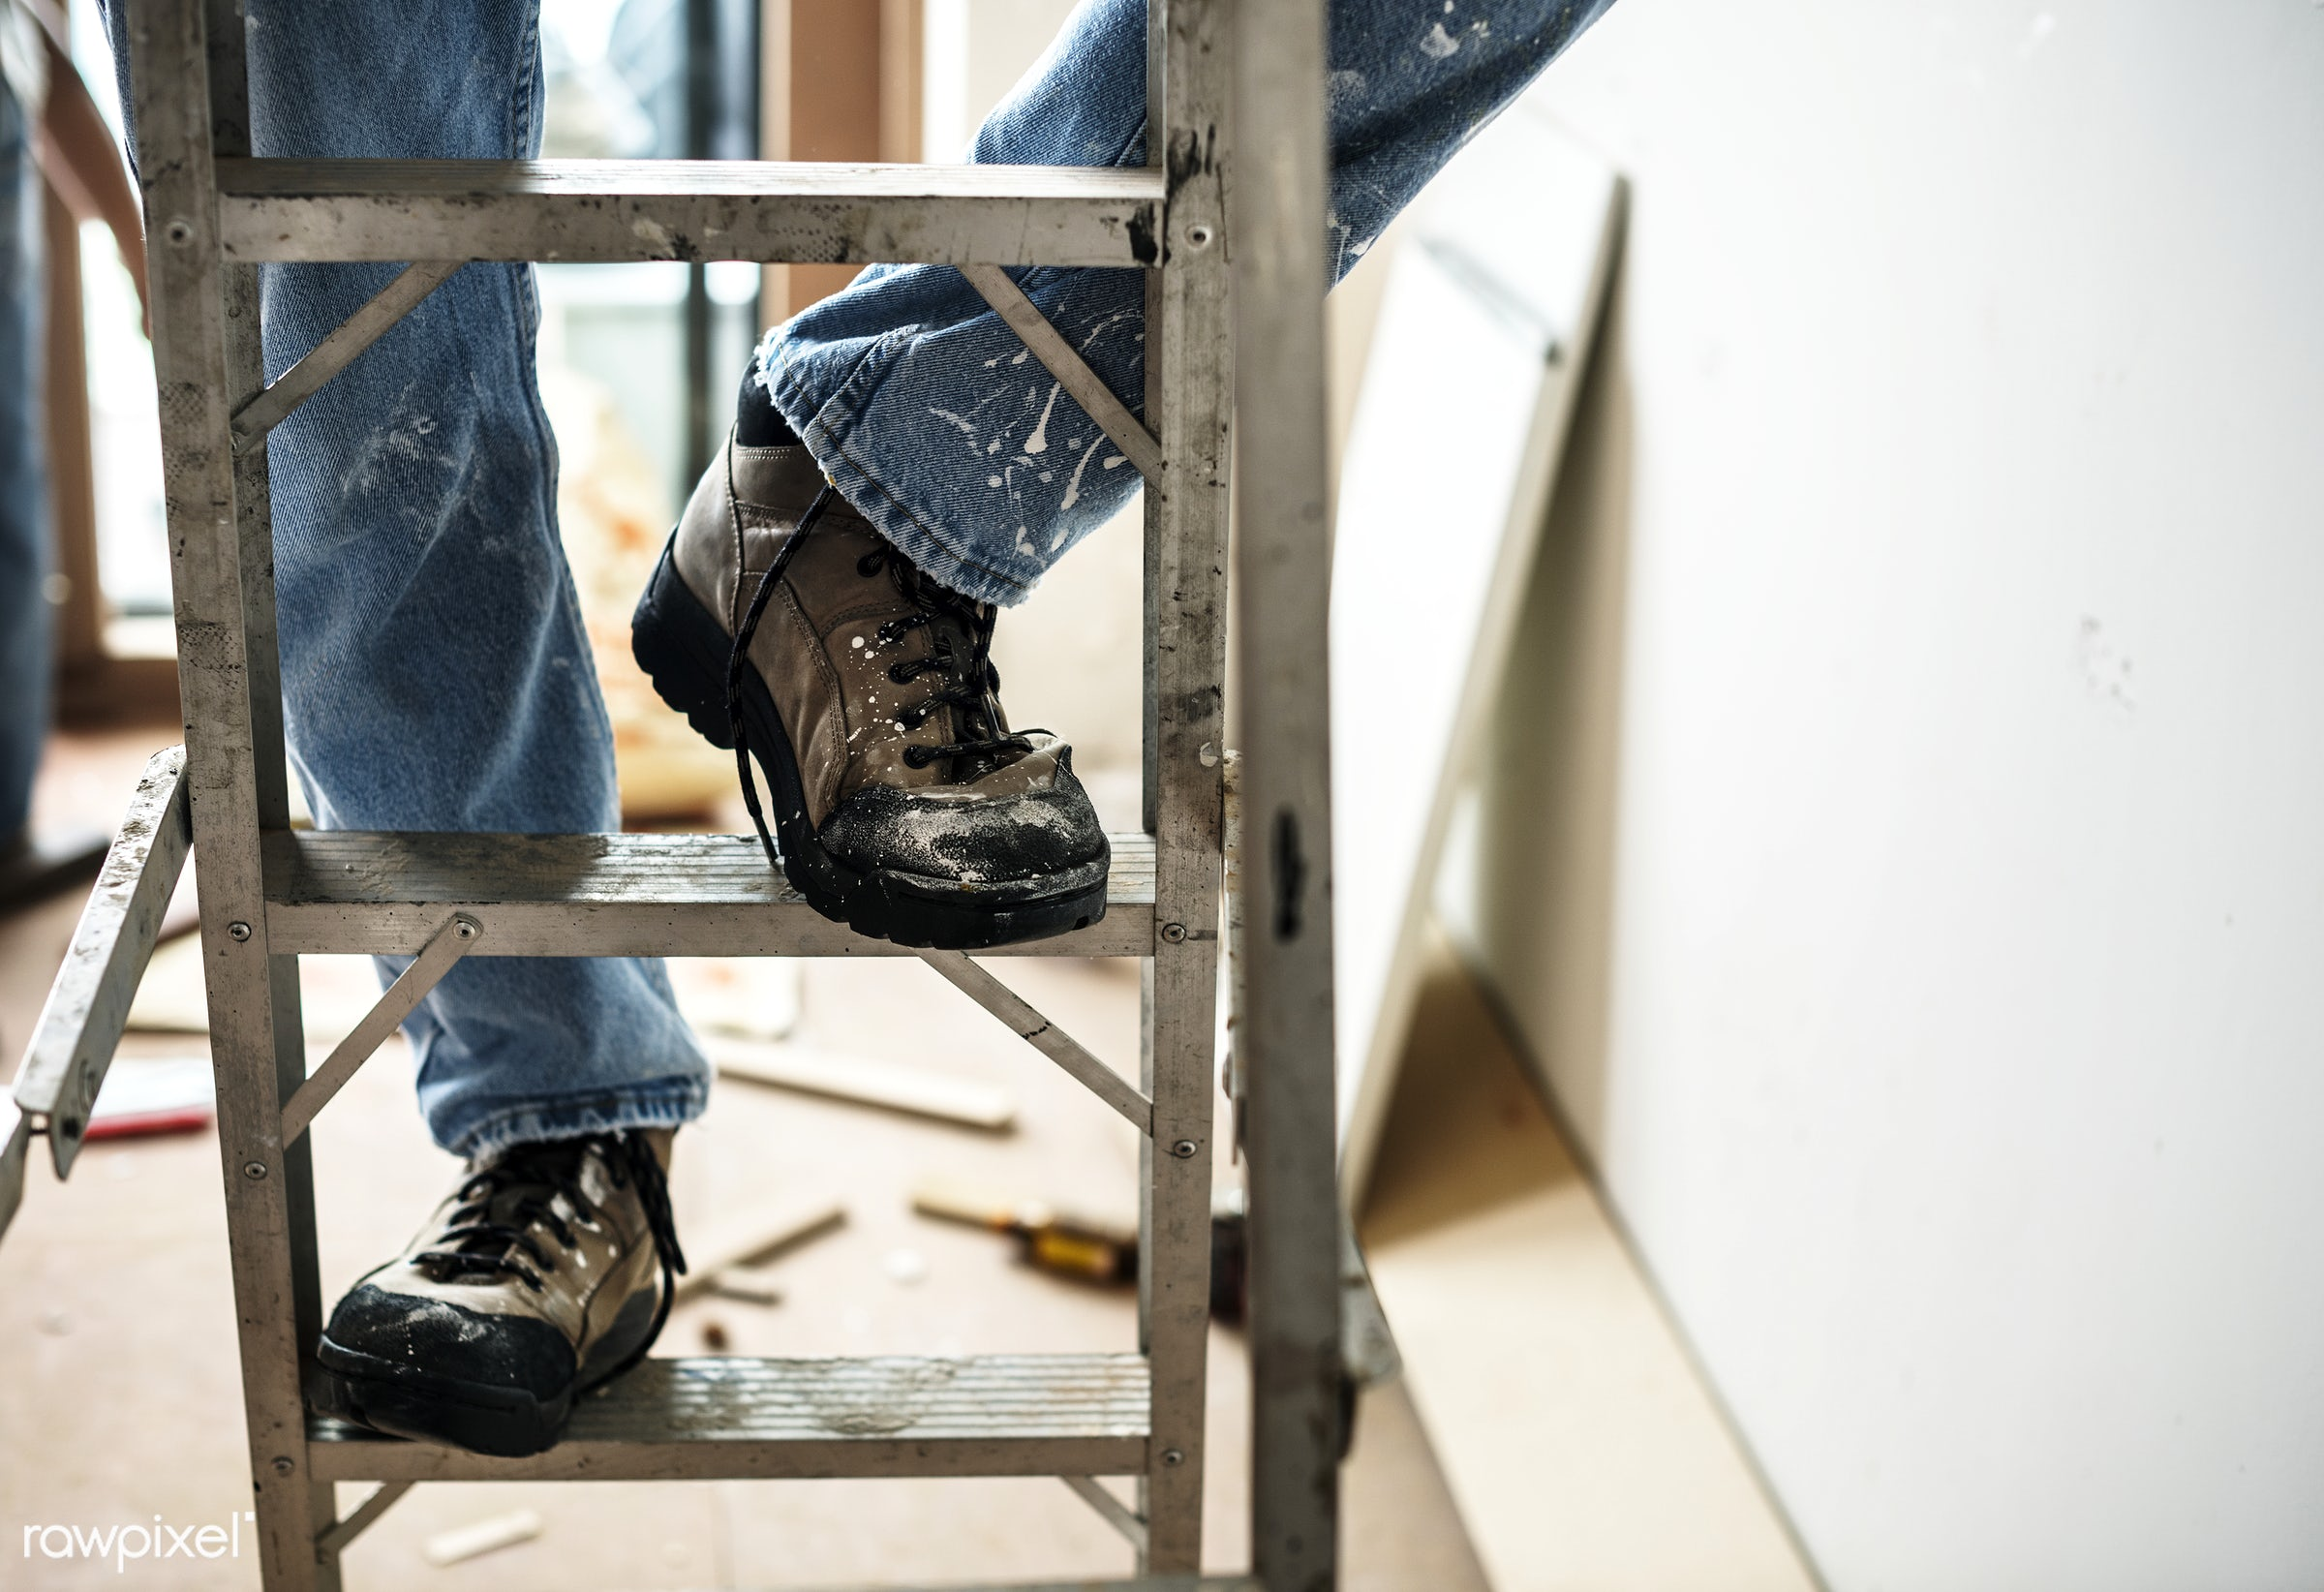 Construction worker - workman, build, builder, construction, craftsman, equipment, handyman, laborer, ladder, materials,...